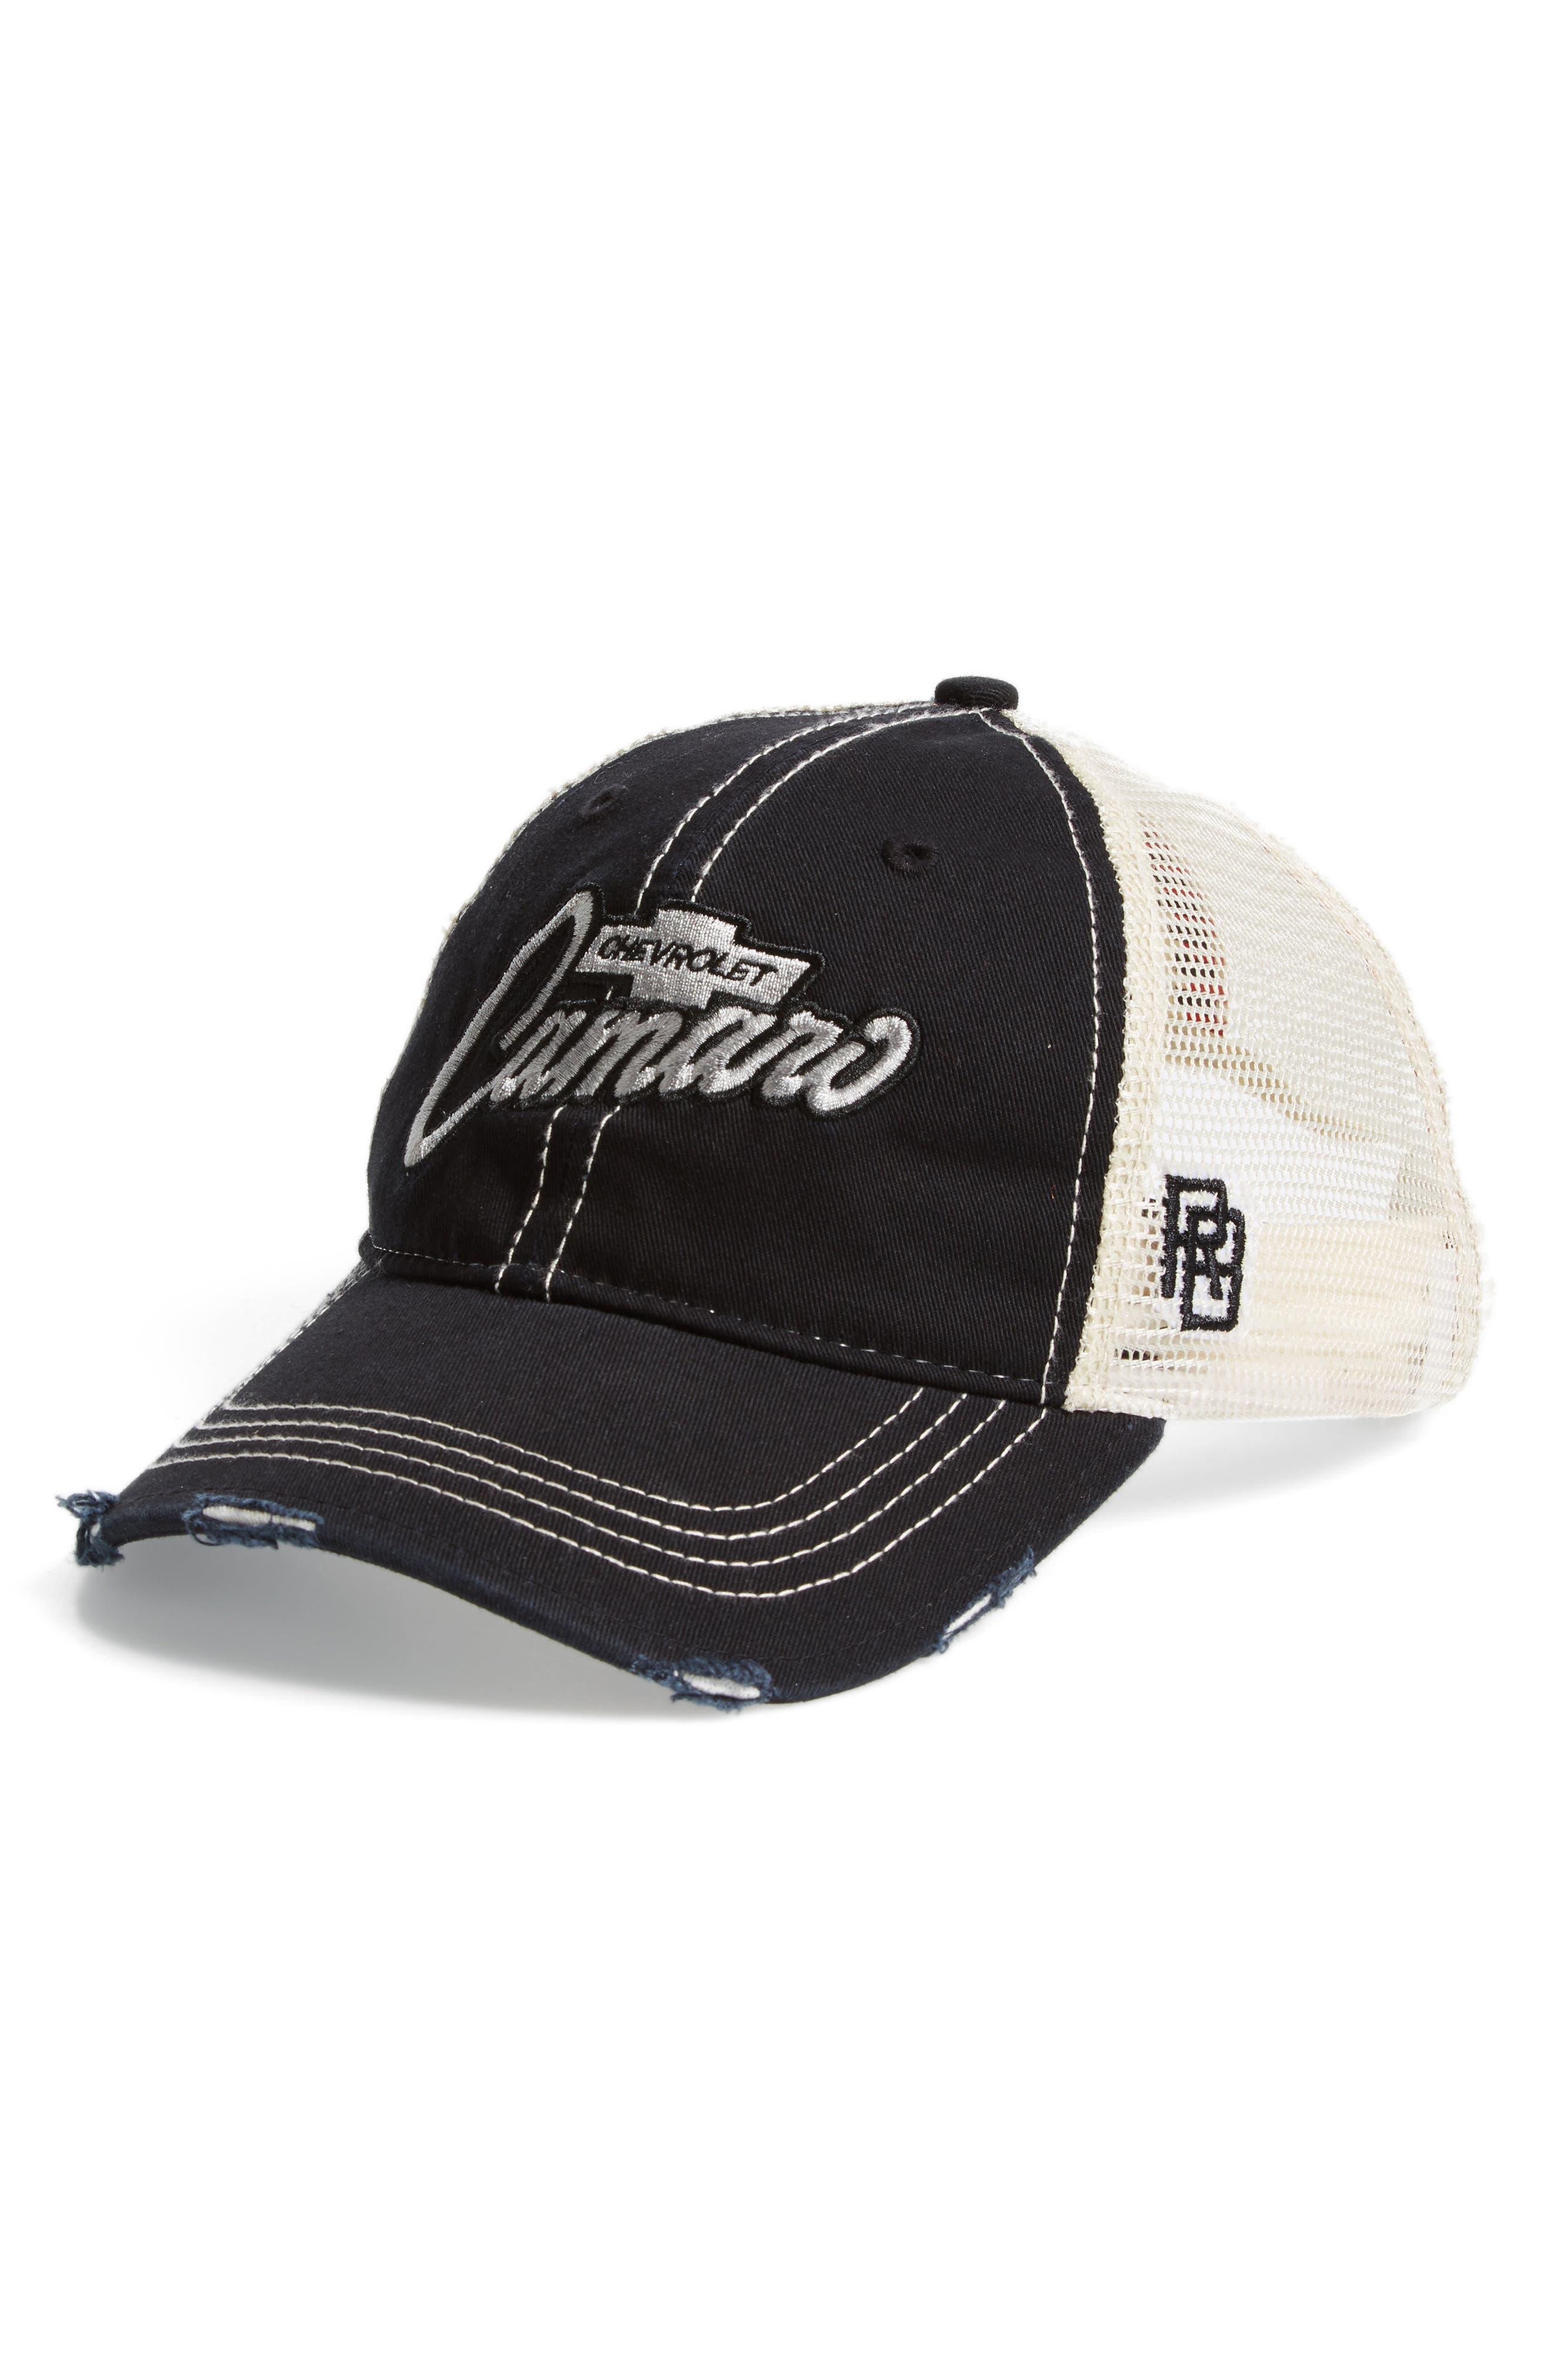 Original Retro Brand Camaro Trucker Hat